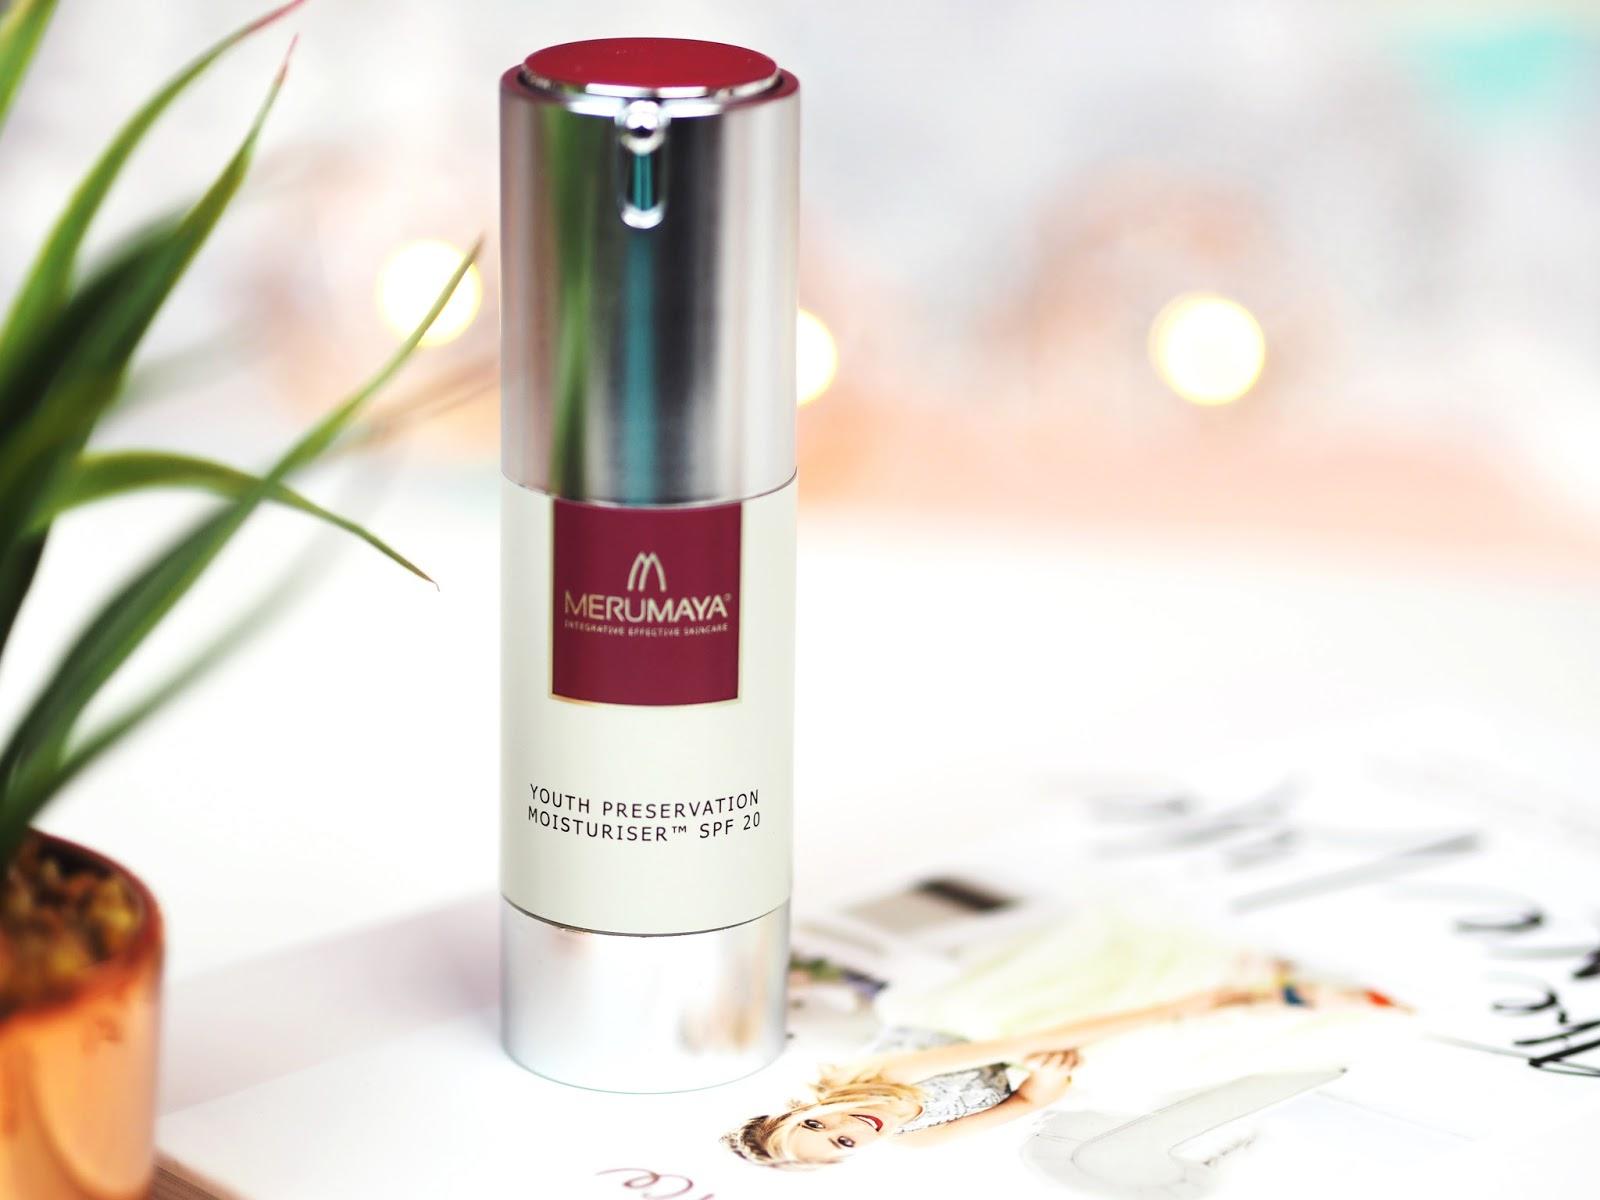 merumaya brand focus youth preservation moisturiser giveaway